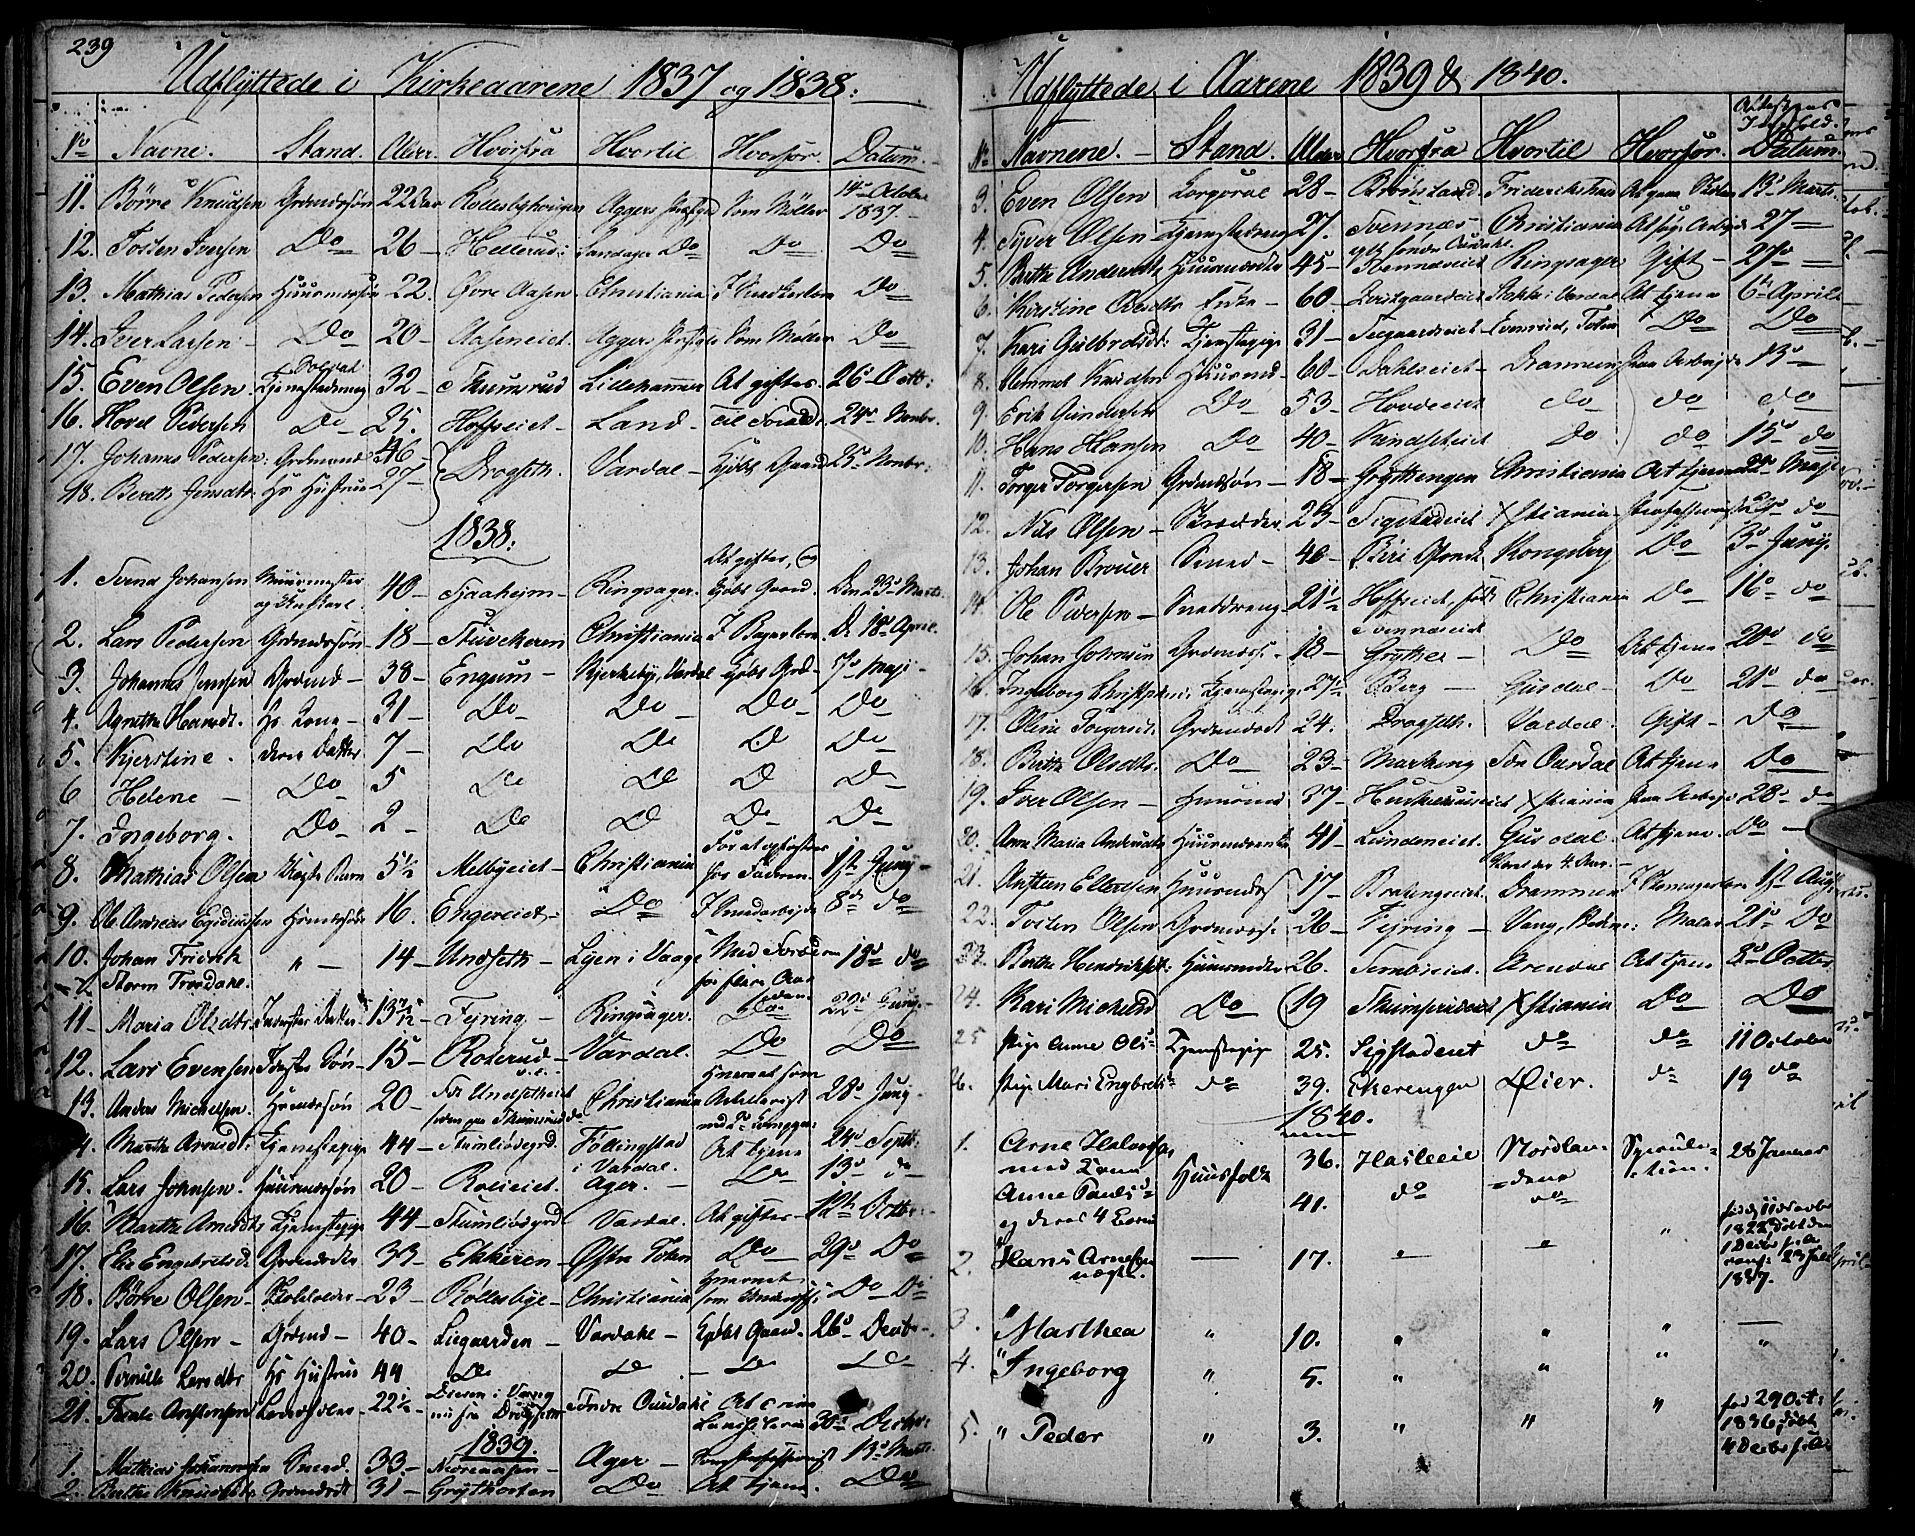 SAH, Biri prestekontor, Ministerialbok nr. 4, 1829-1842, s. 239